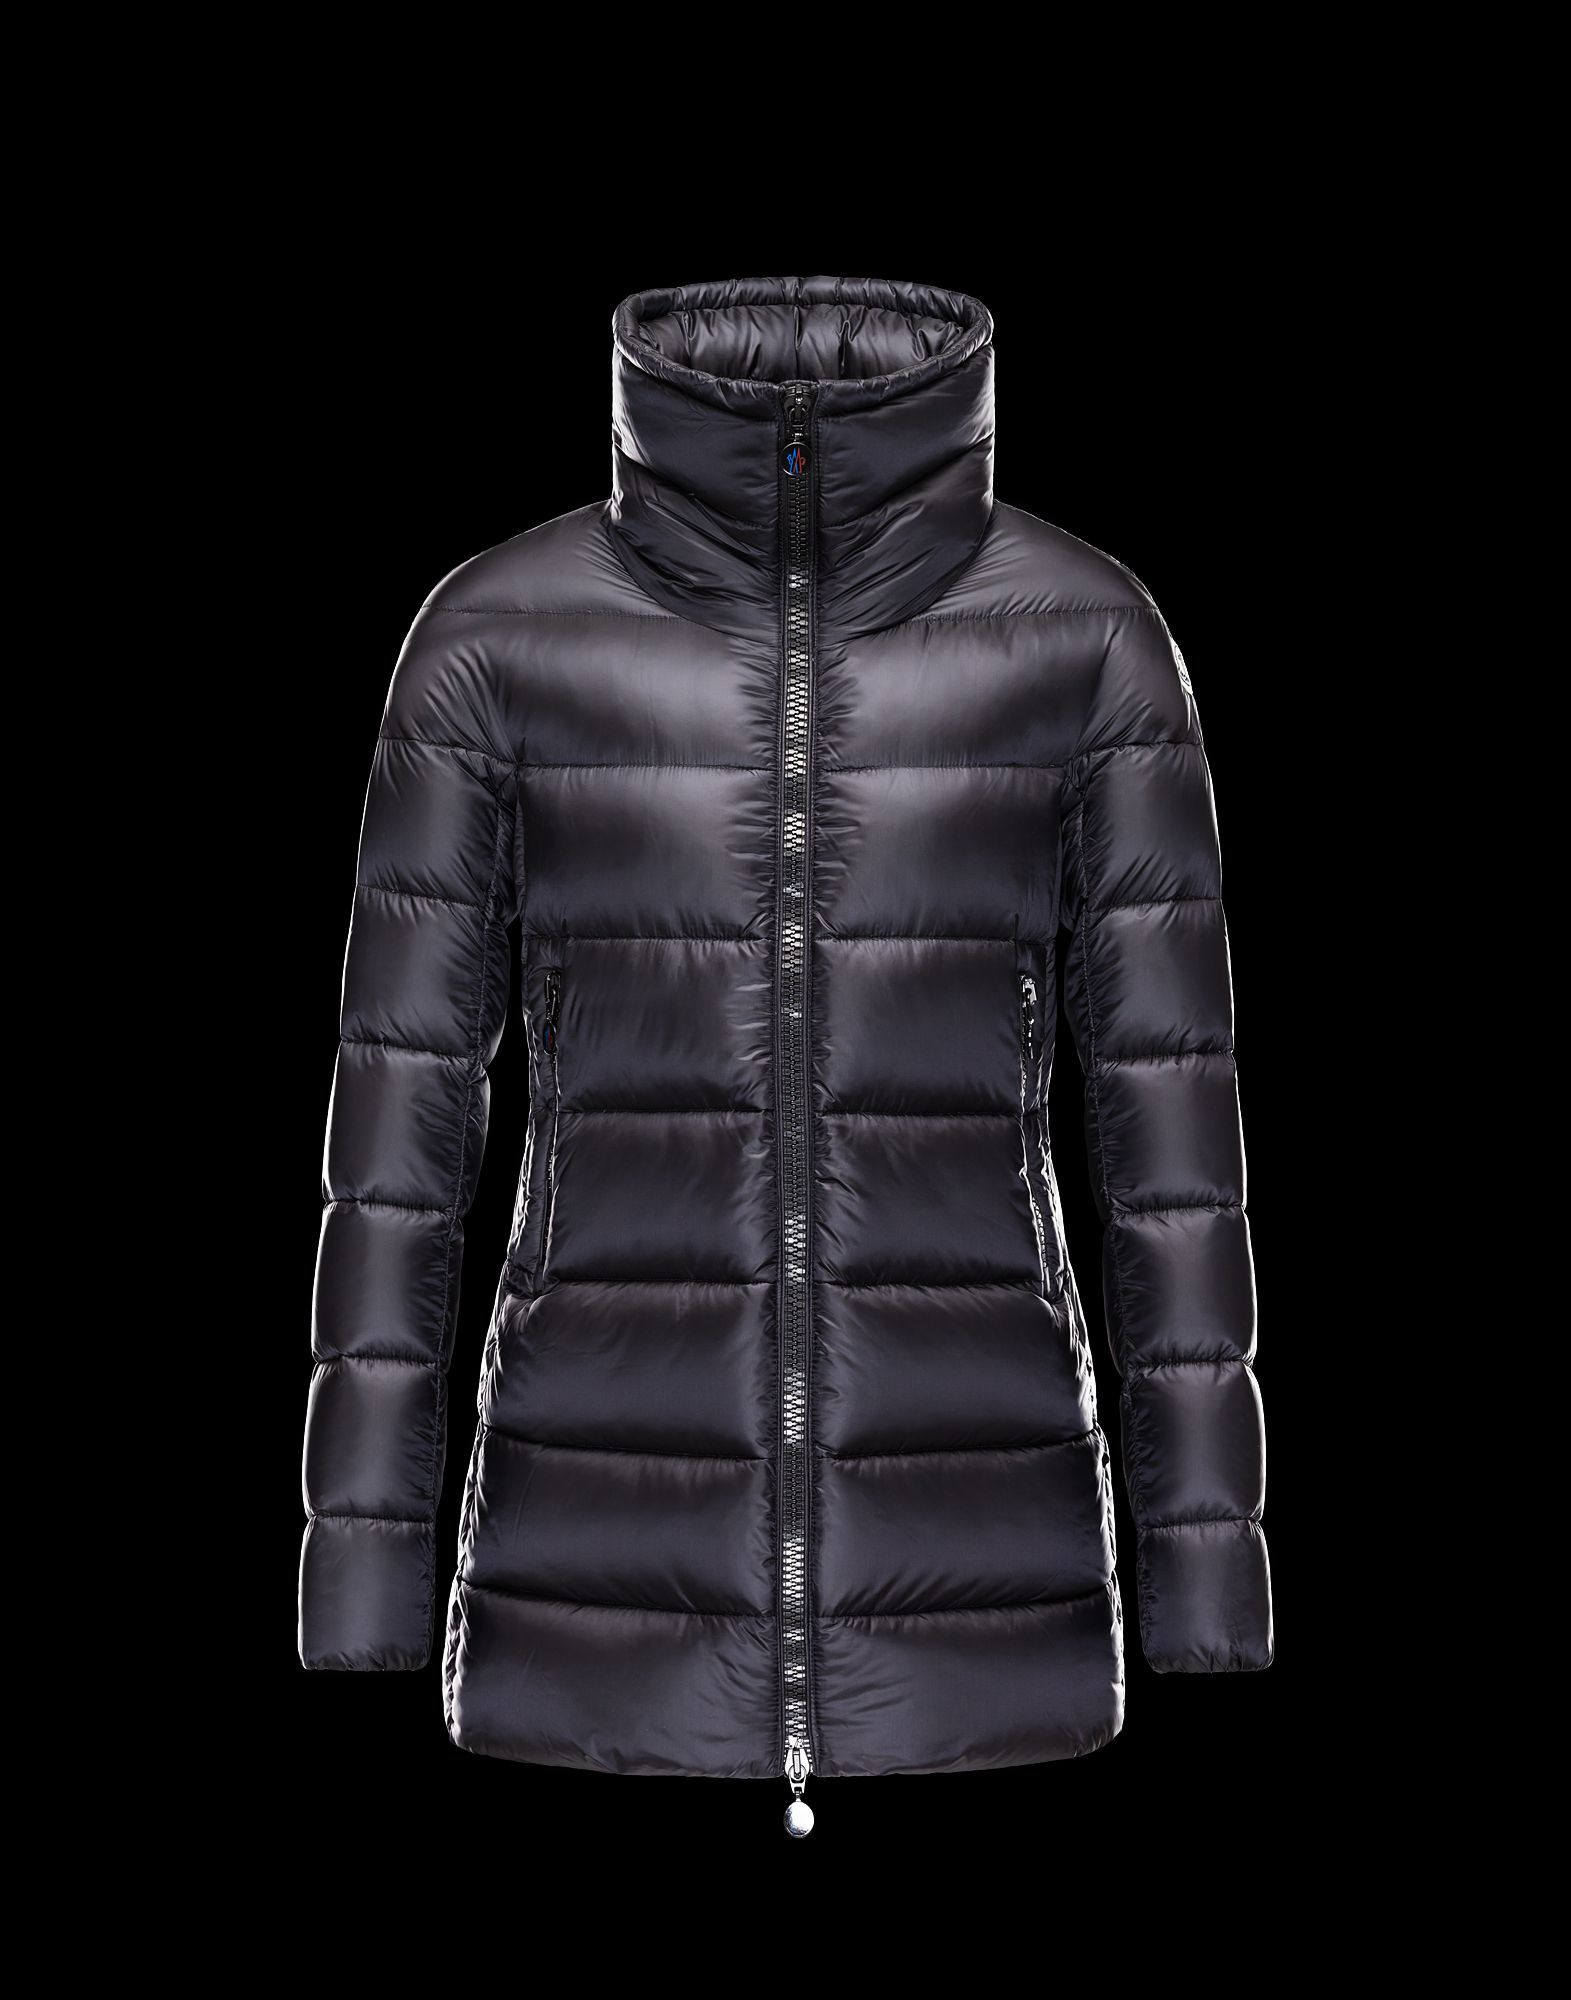 Cheap Moncler Coats Moncler jacket women, Moncler jacket